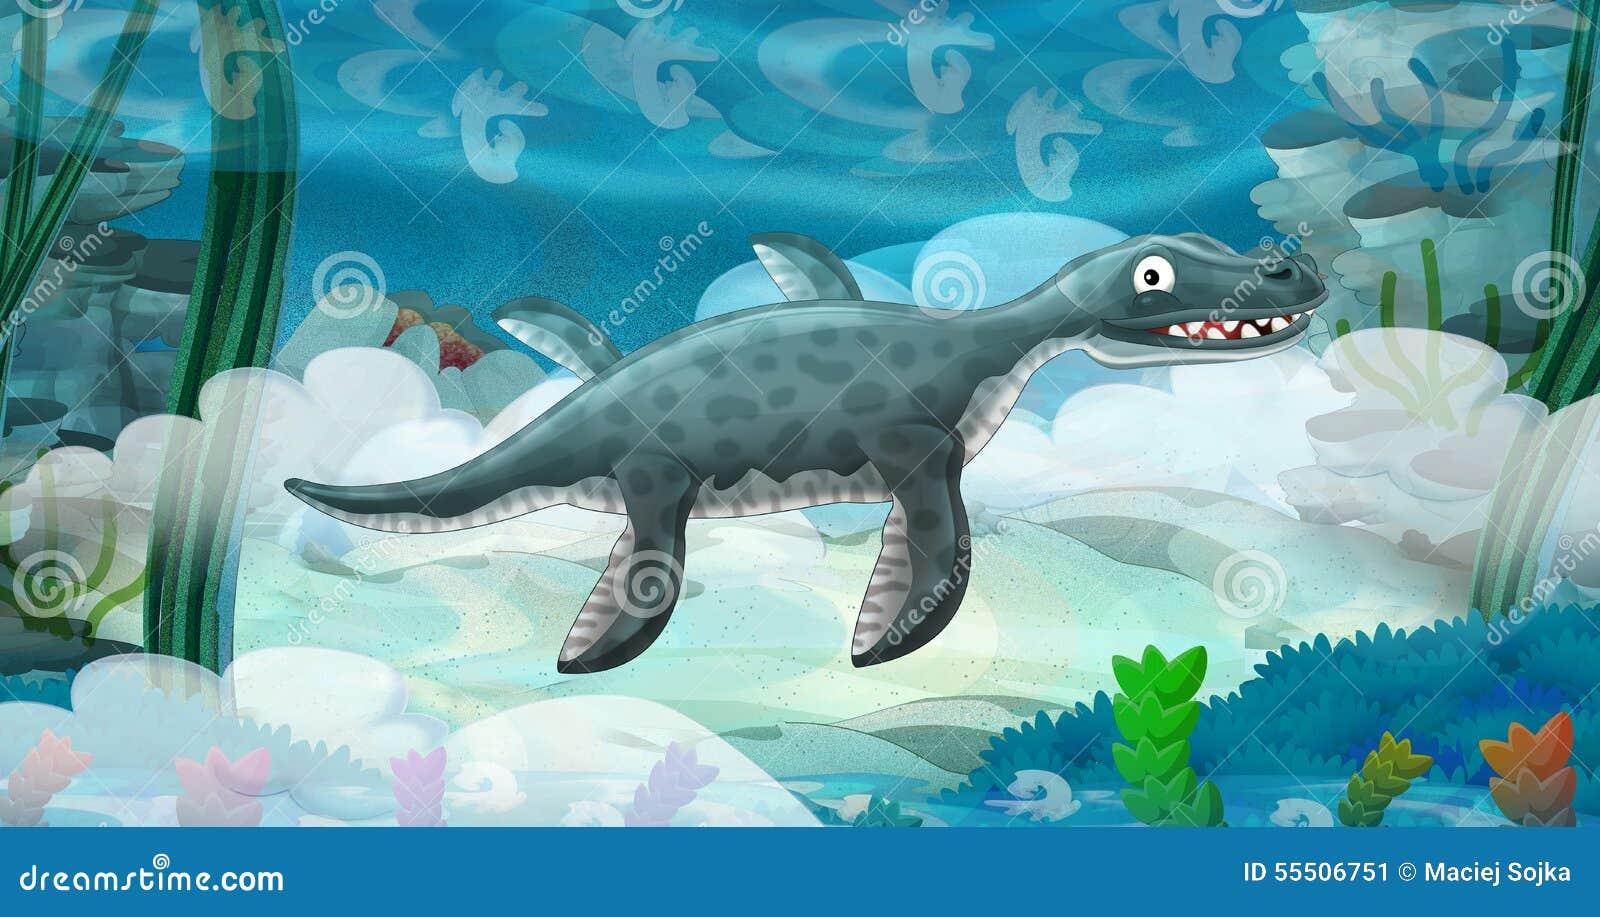 Cartoon Underwater Dinosaur Stock Illustration - Image ...